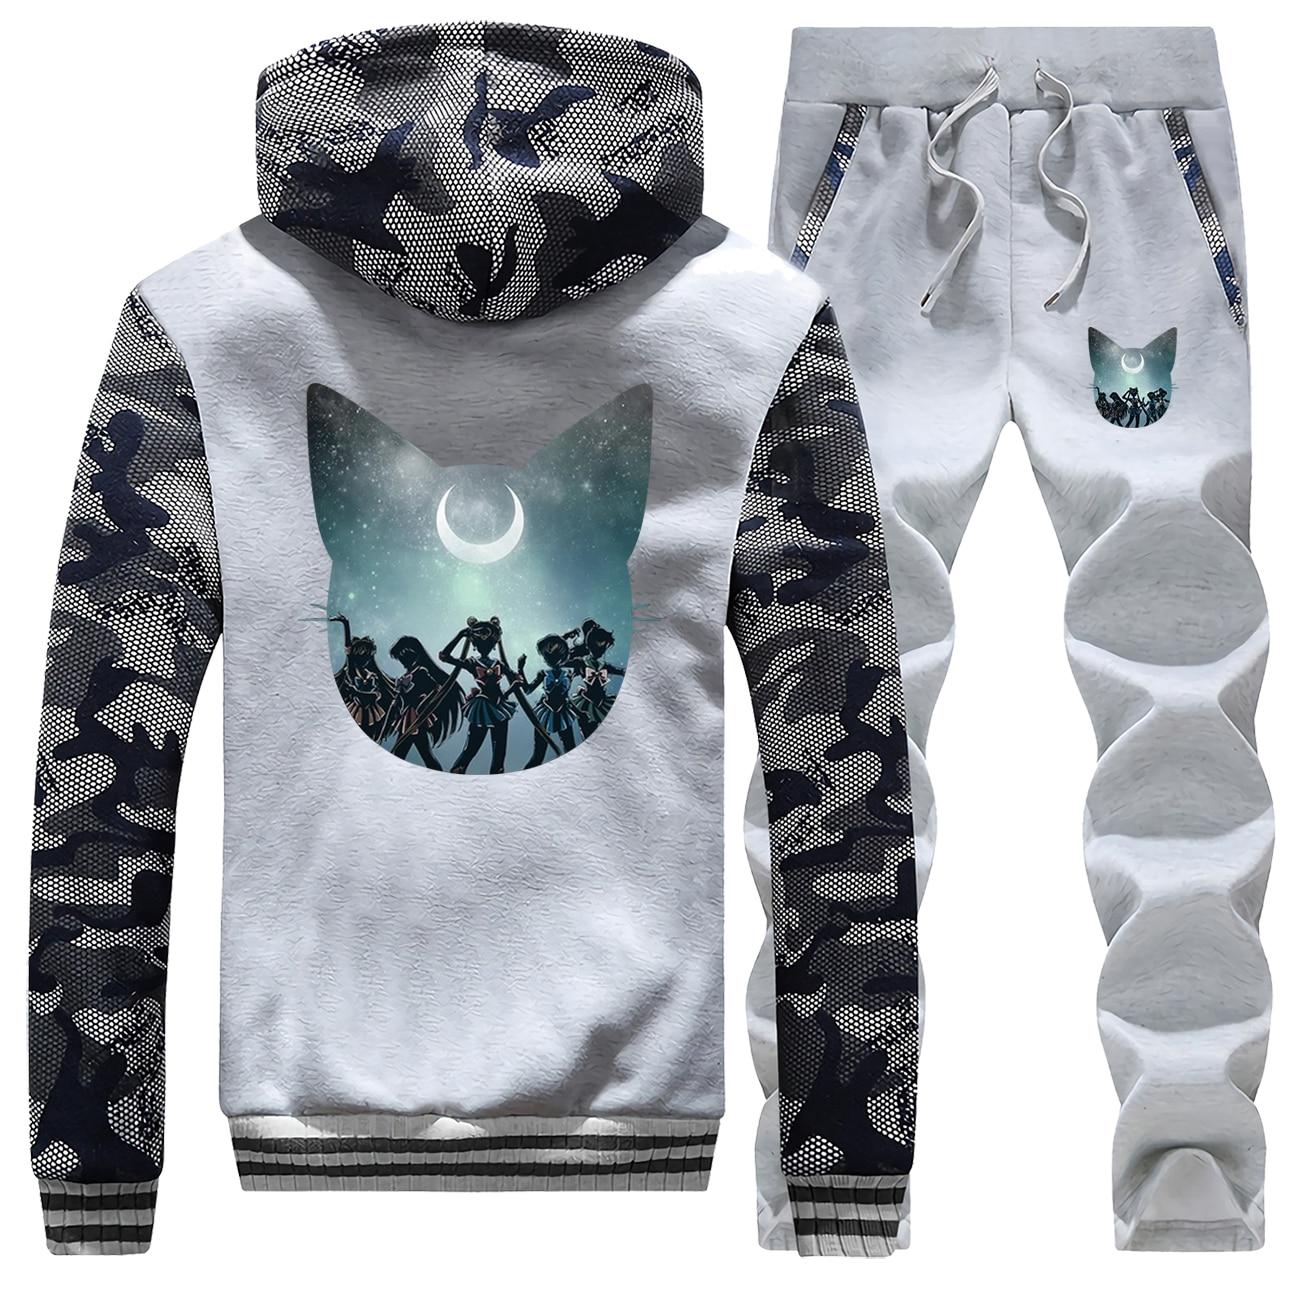 Winter 2019 Hot Sale Sweatshirt Cartoon Men Camouflage Sailor Moon Hip Hop Hoodie Fashion Suit Warm Jackets+2 Piece Set Pants